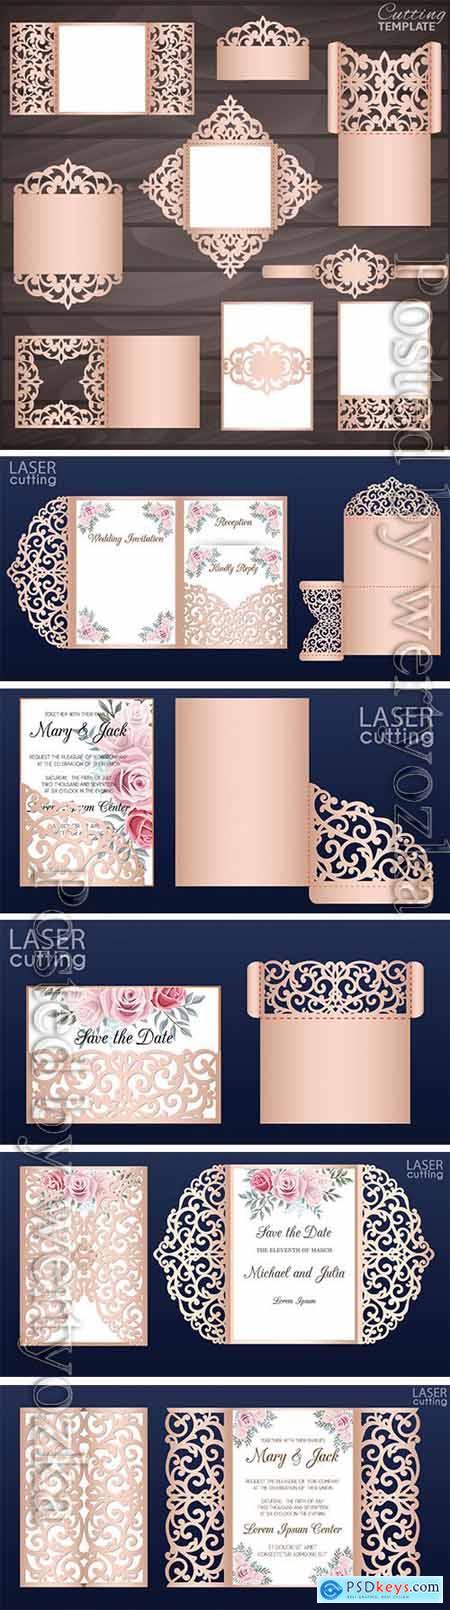 Wedding collection vector cards, invitation, envelopes